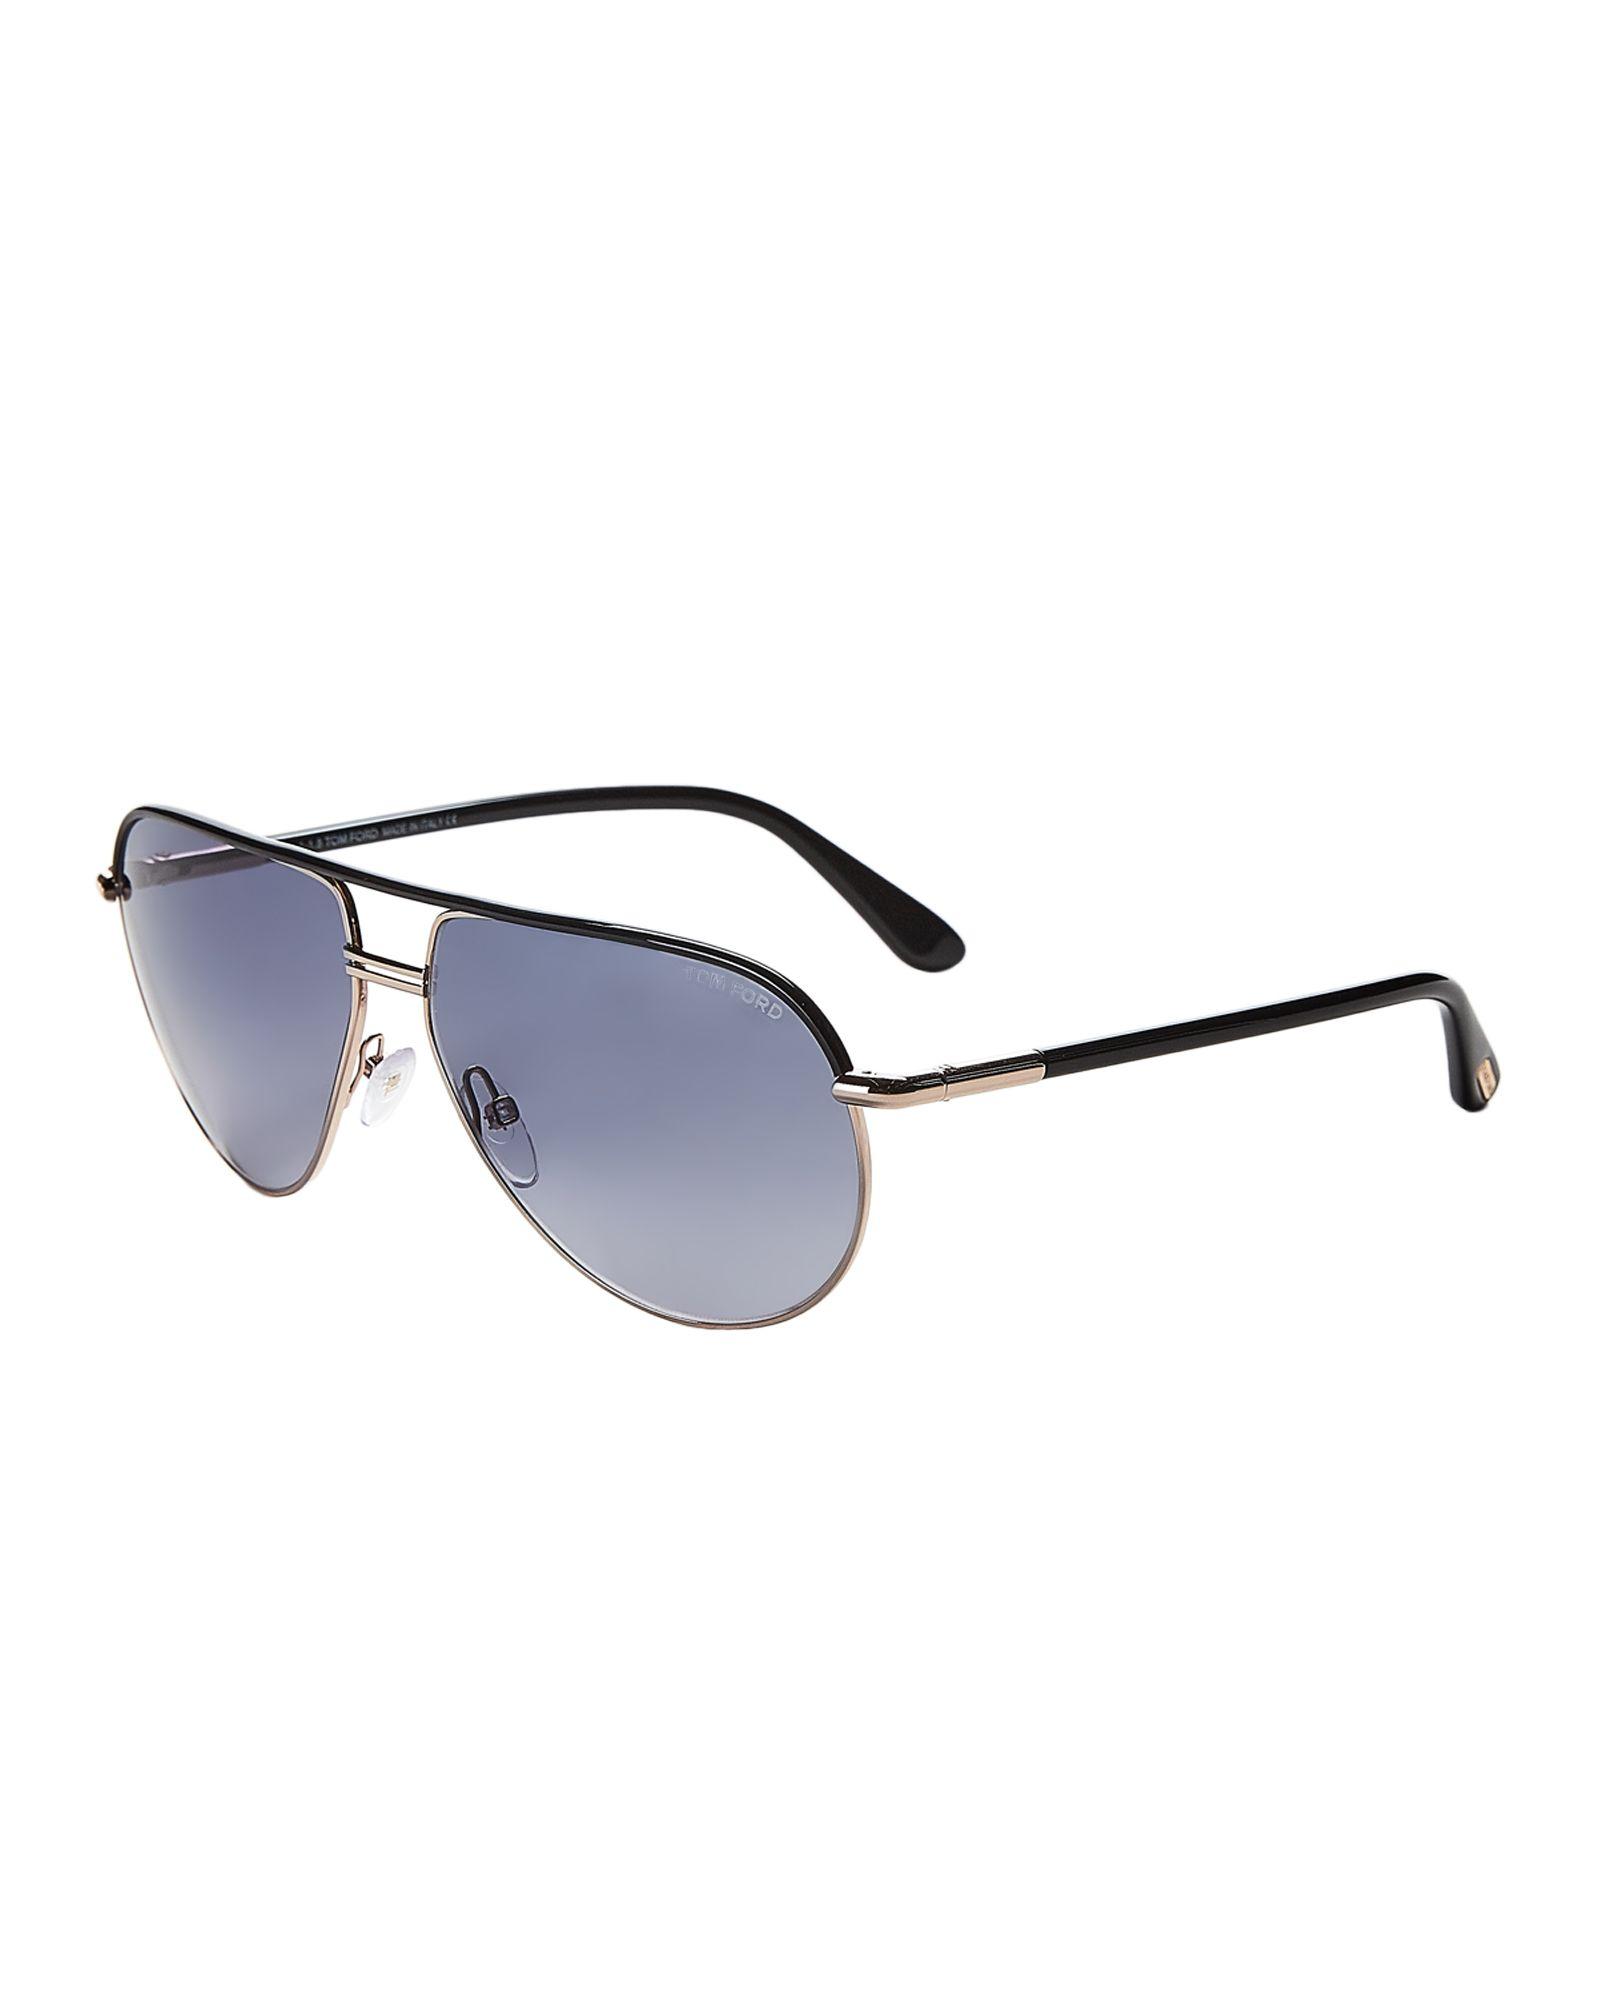 6e4b8317d5e Tom Ford TF285 Cole Black   Gold-Tone Aviator Sunglasses